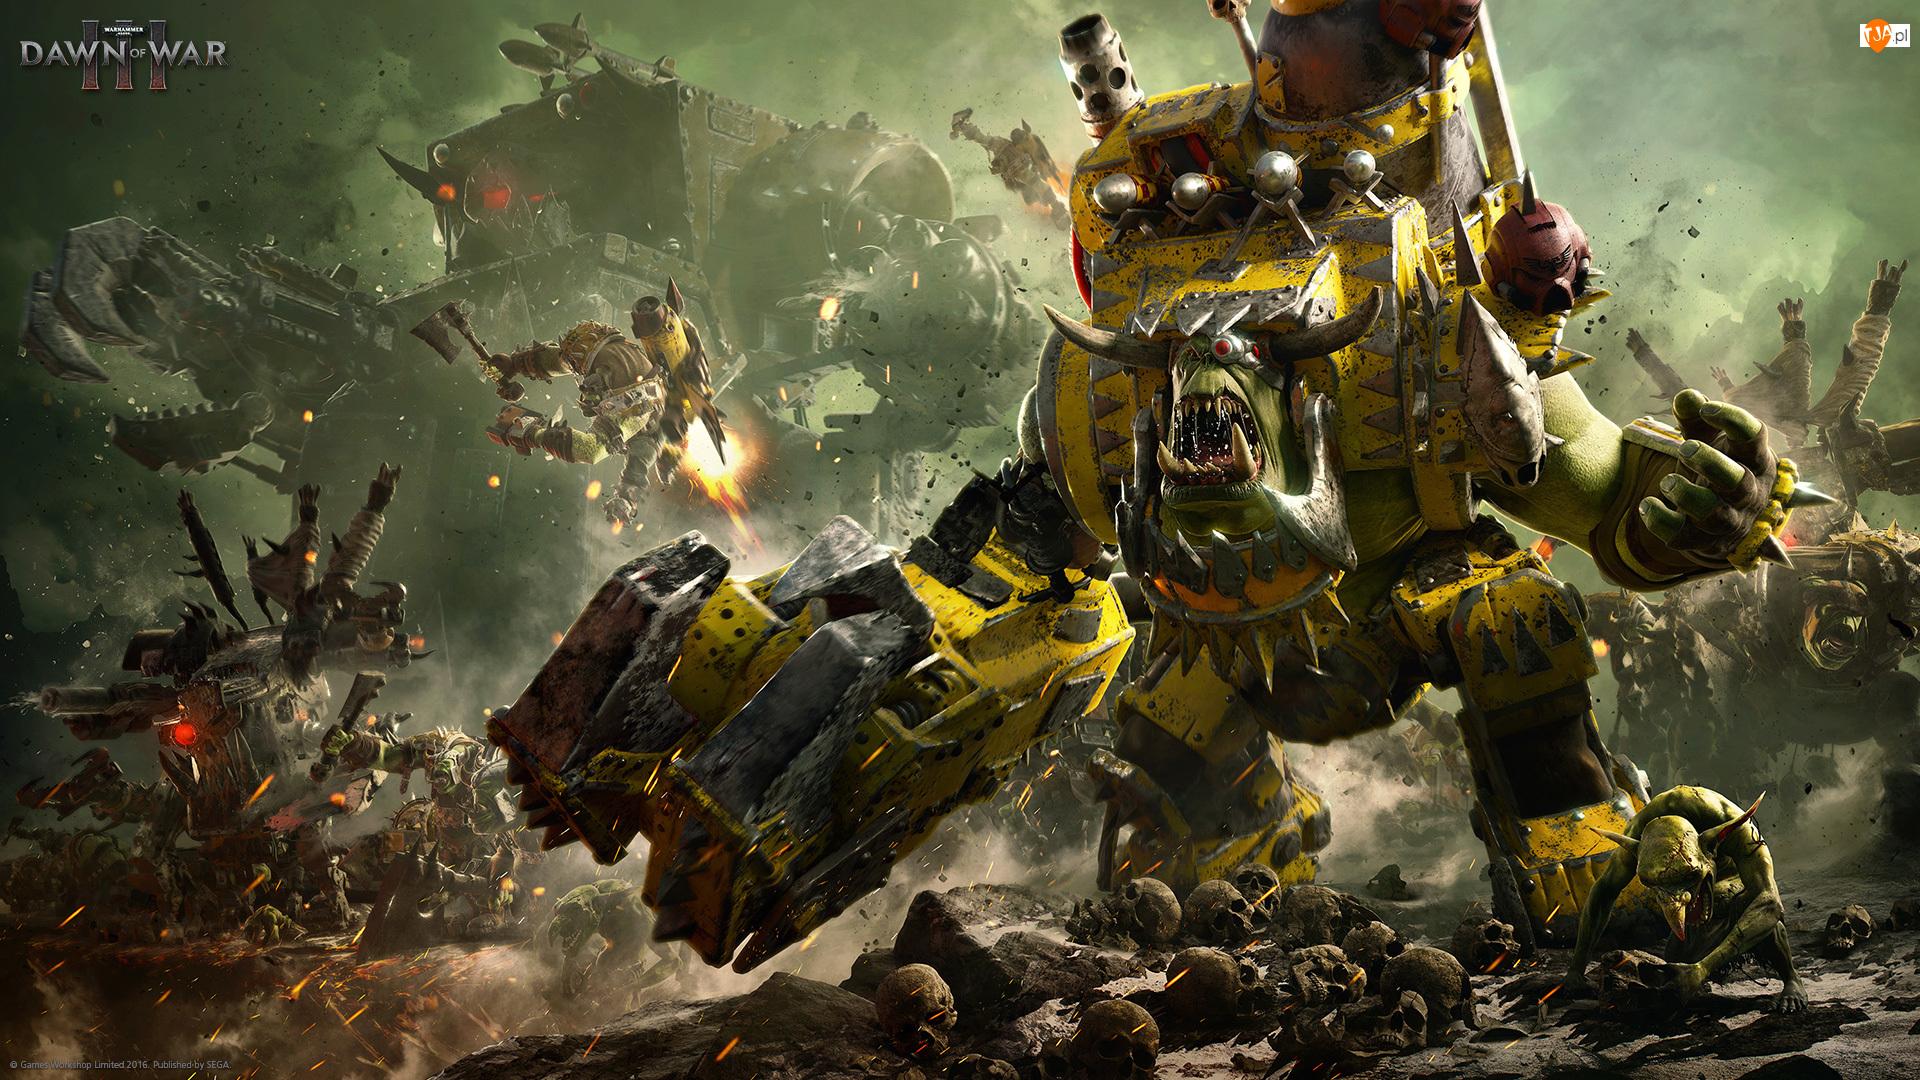 Gra, Ork, Warhammer 40000: Dawn Of War III, Postać